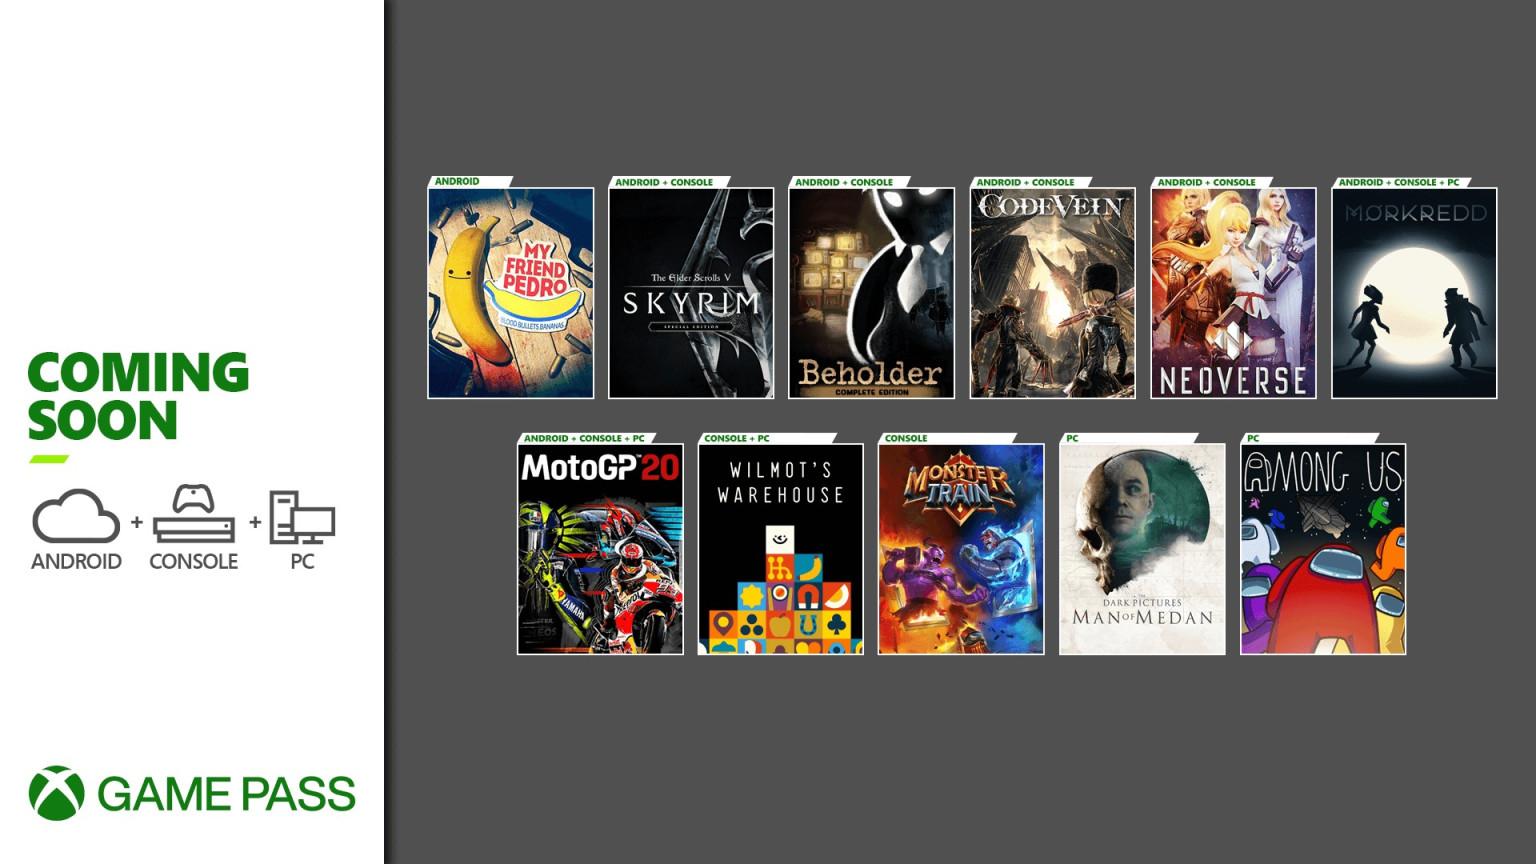 Xbox Game Pass: Ανακοινώθηκαν οι νέες προσθήκες για τον Δεκέμβριο